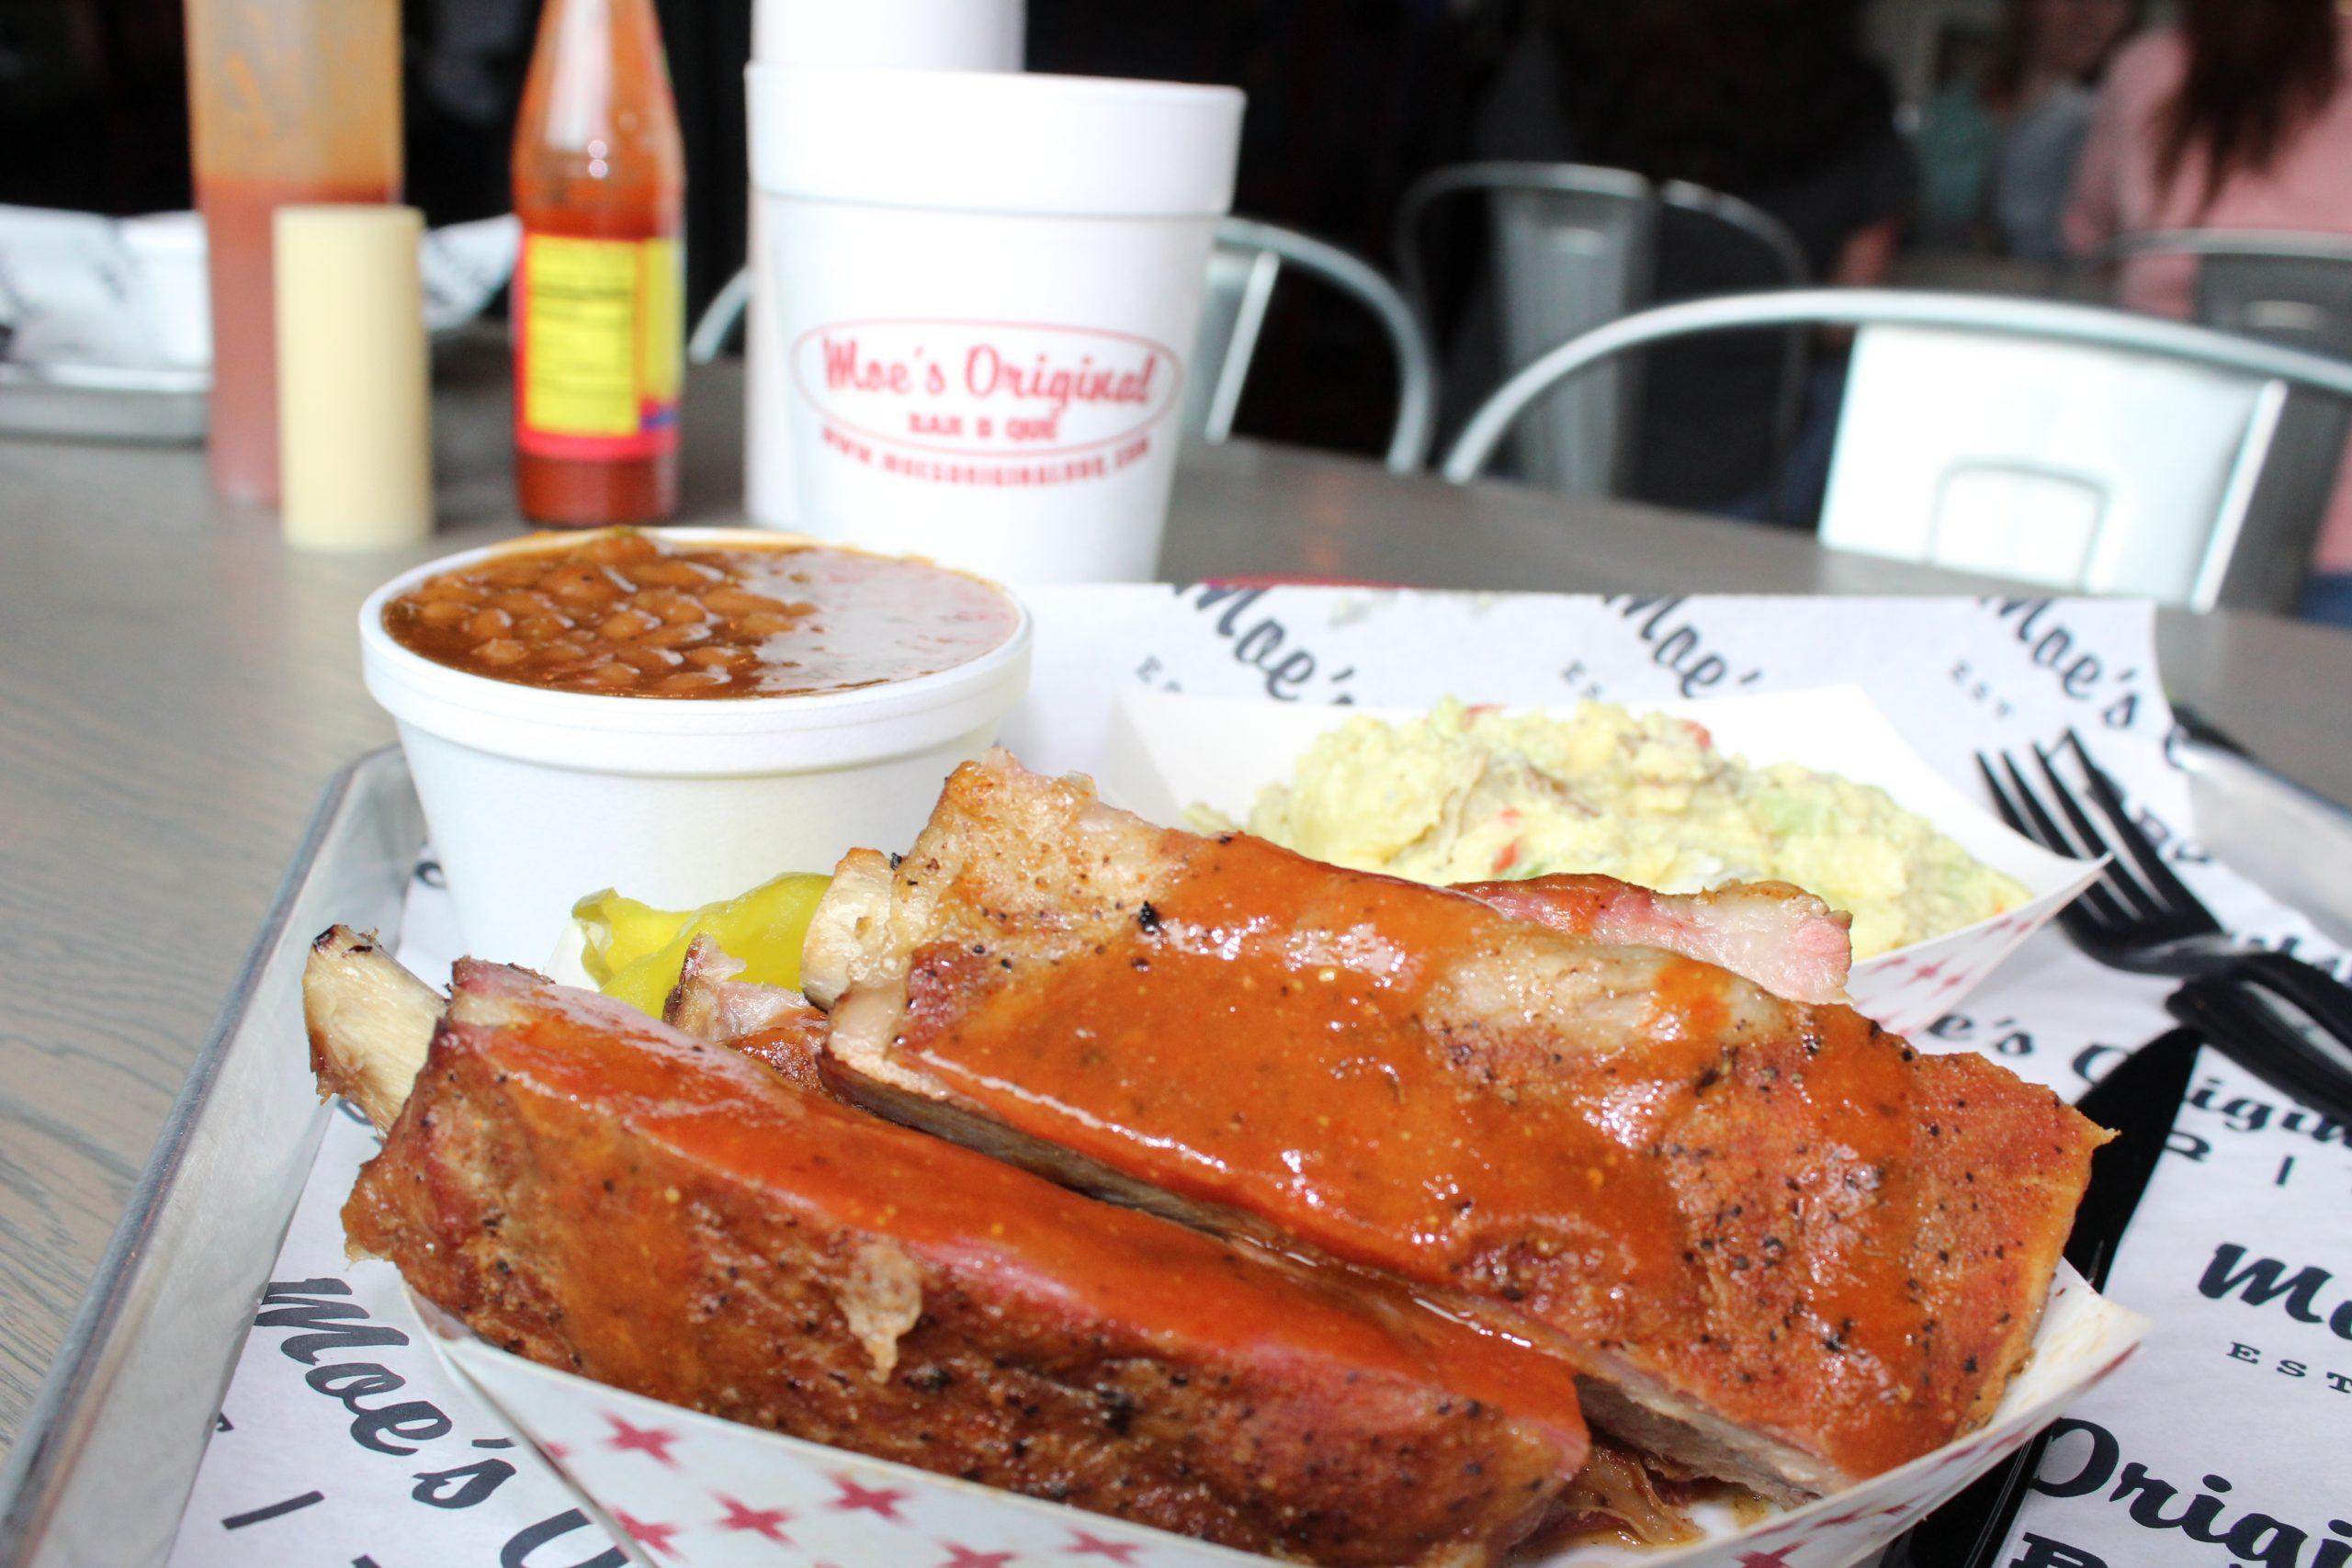 Moe's Original BBQ At Peachtree Corners